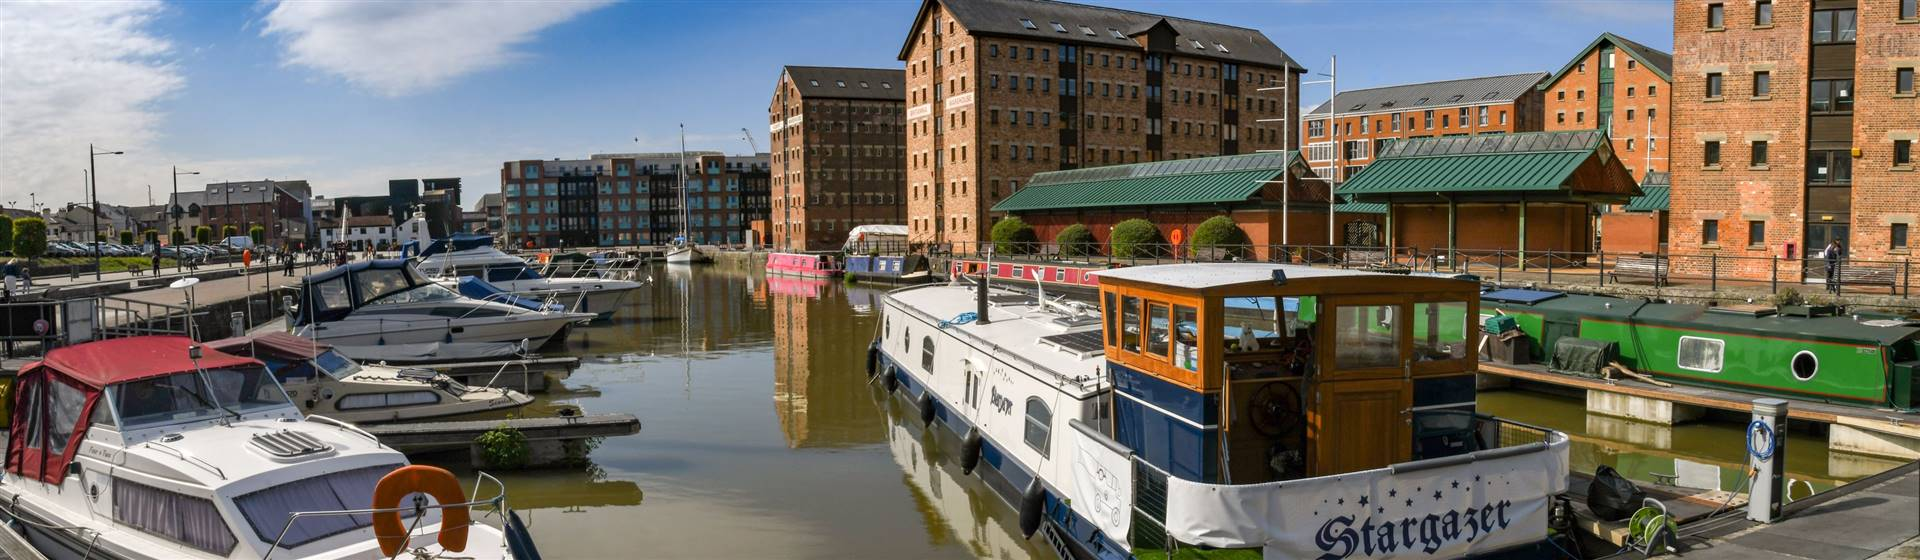 "<img src=""gloucesterdocks-shutterstock.jpeg"" alt=""Gloucester Docks""/>"